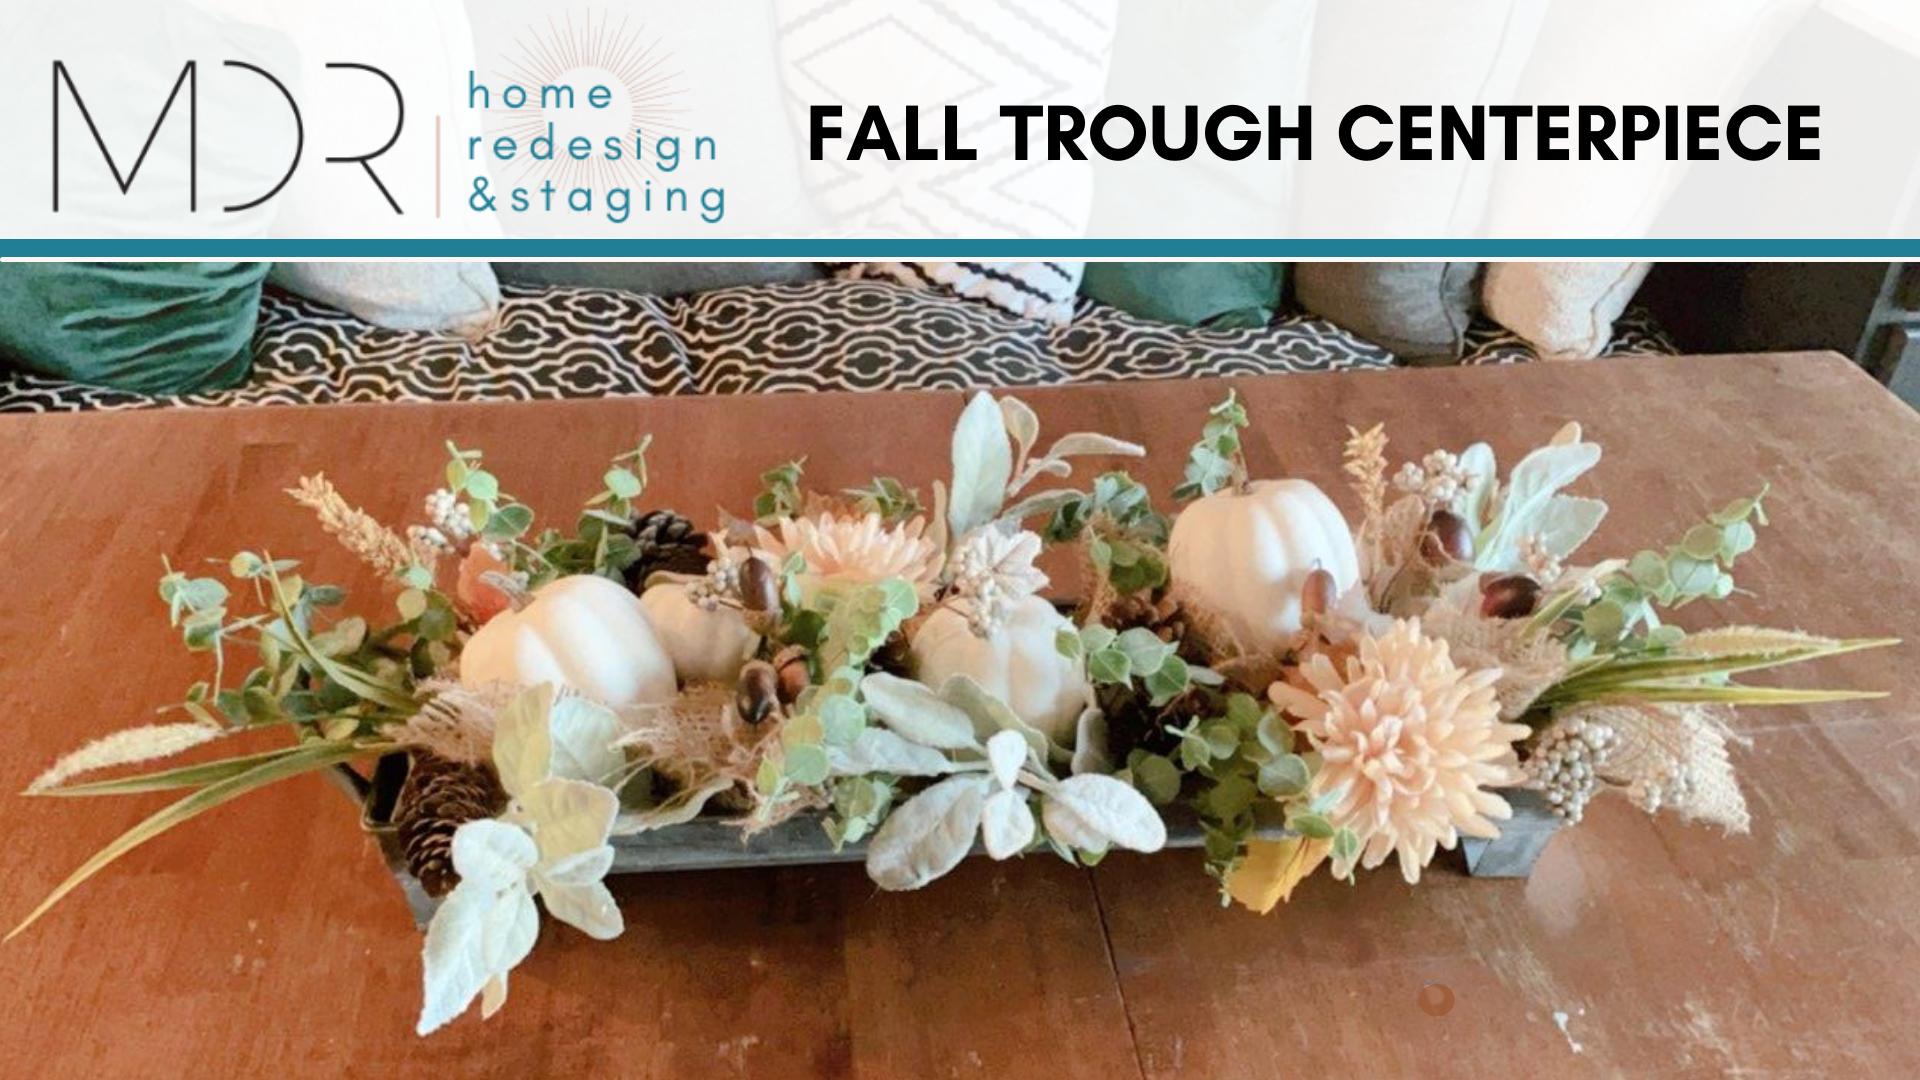 MDR Workshop: Fall Centerpiece